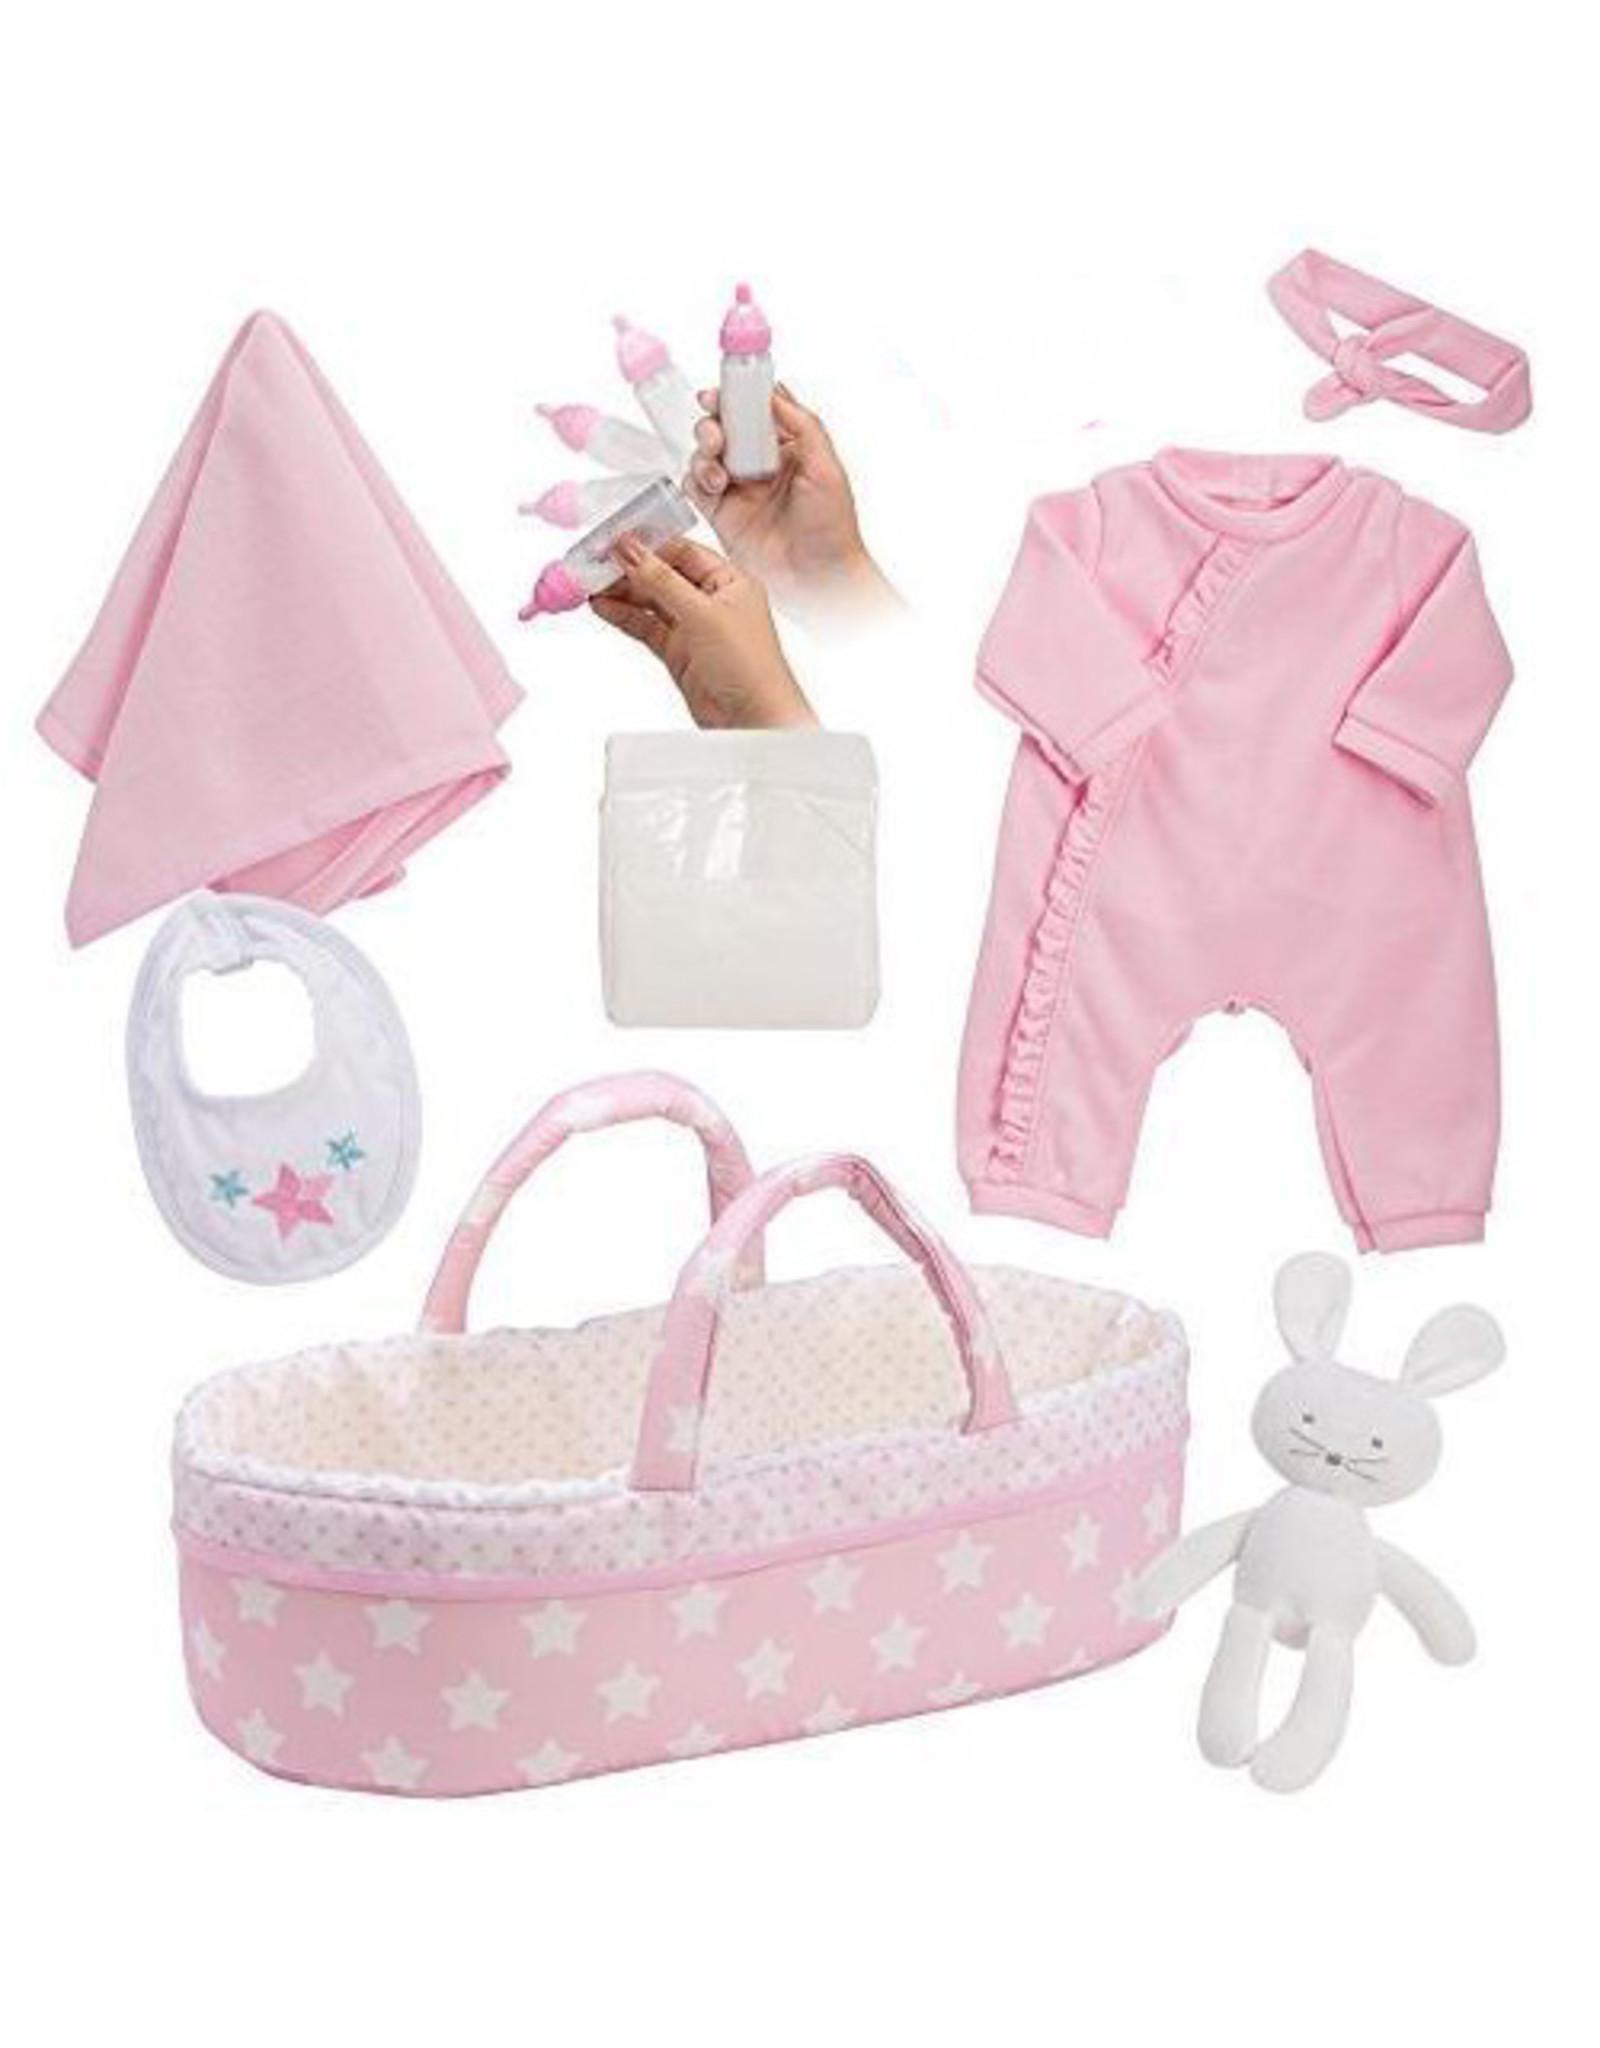 Adora Baby Essentials